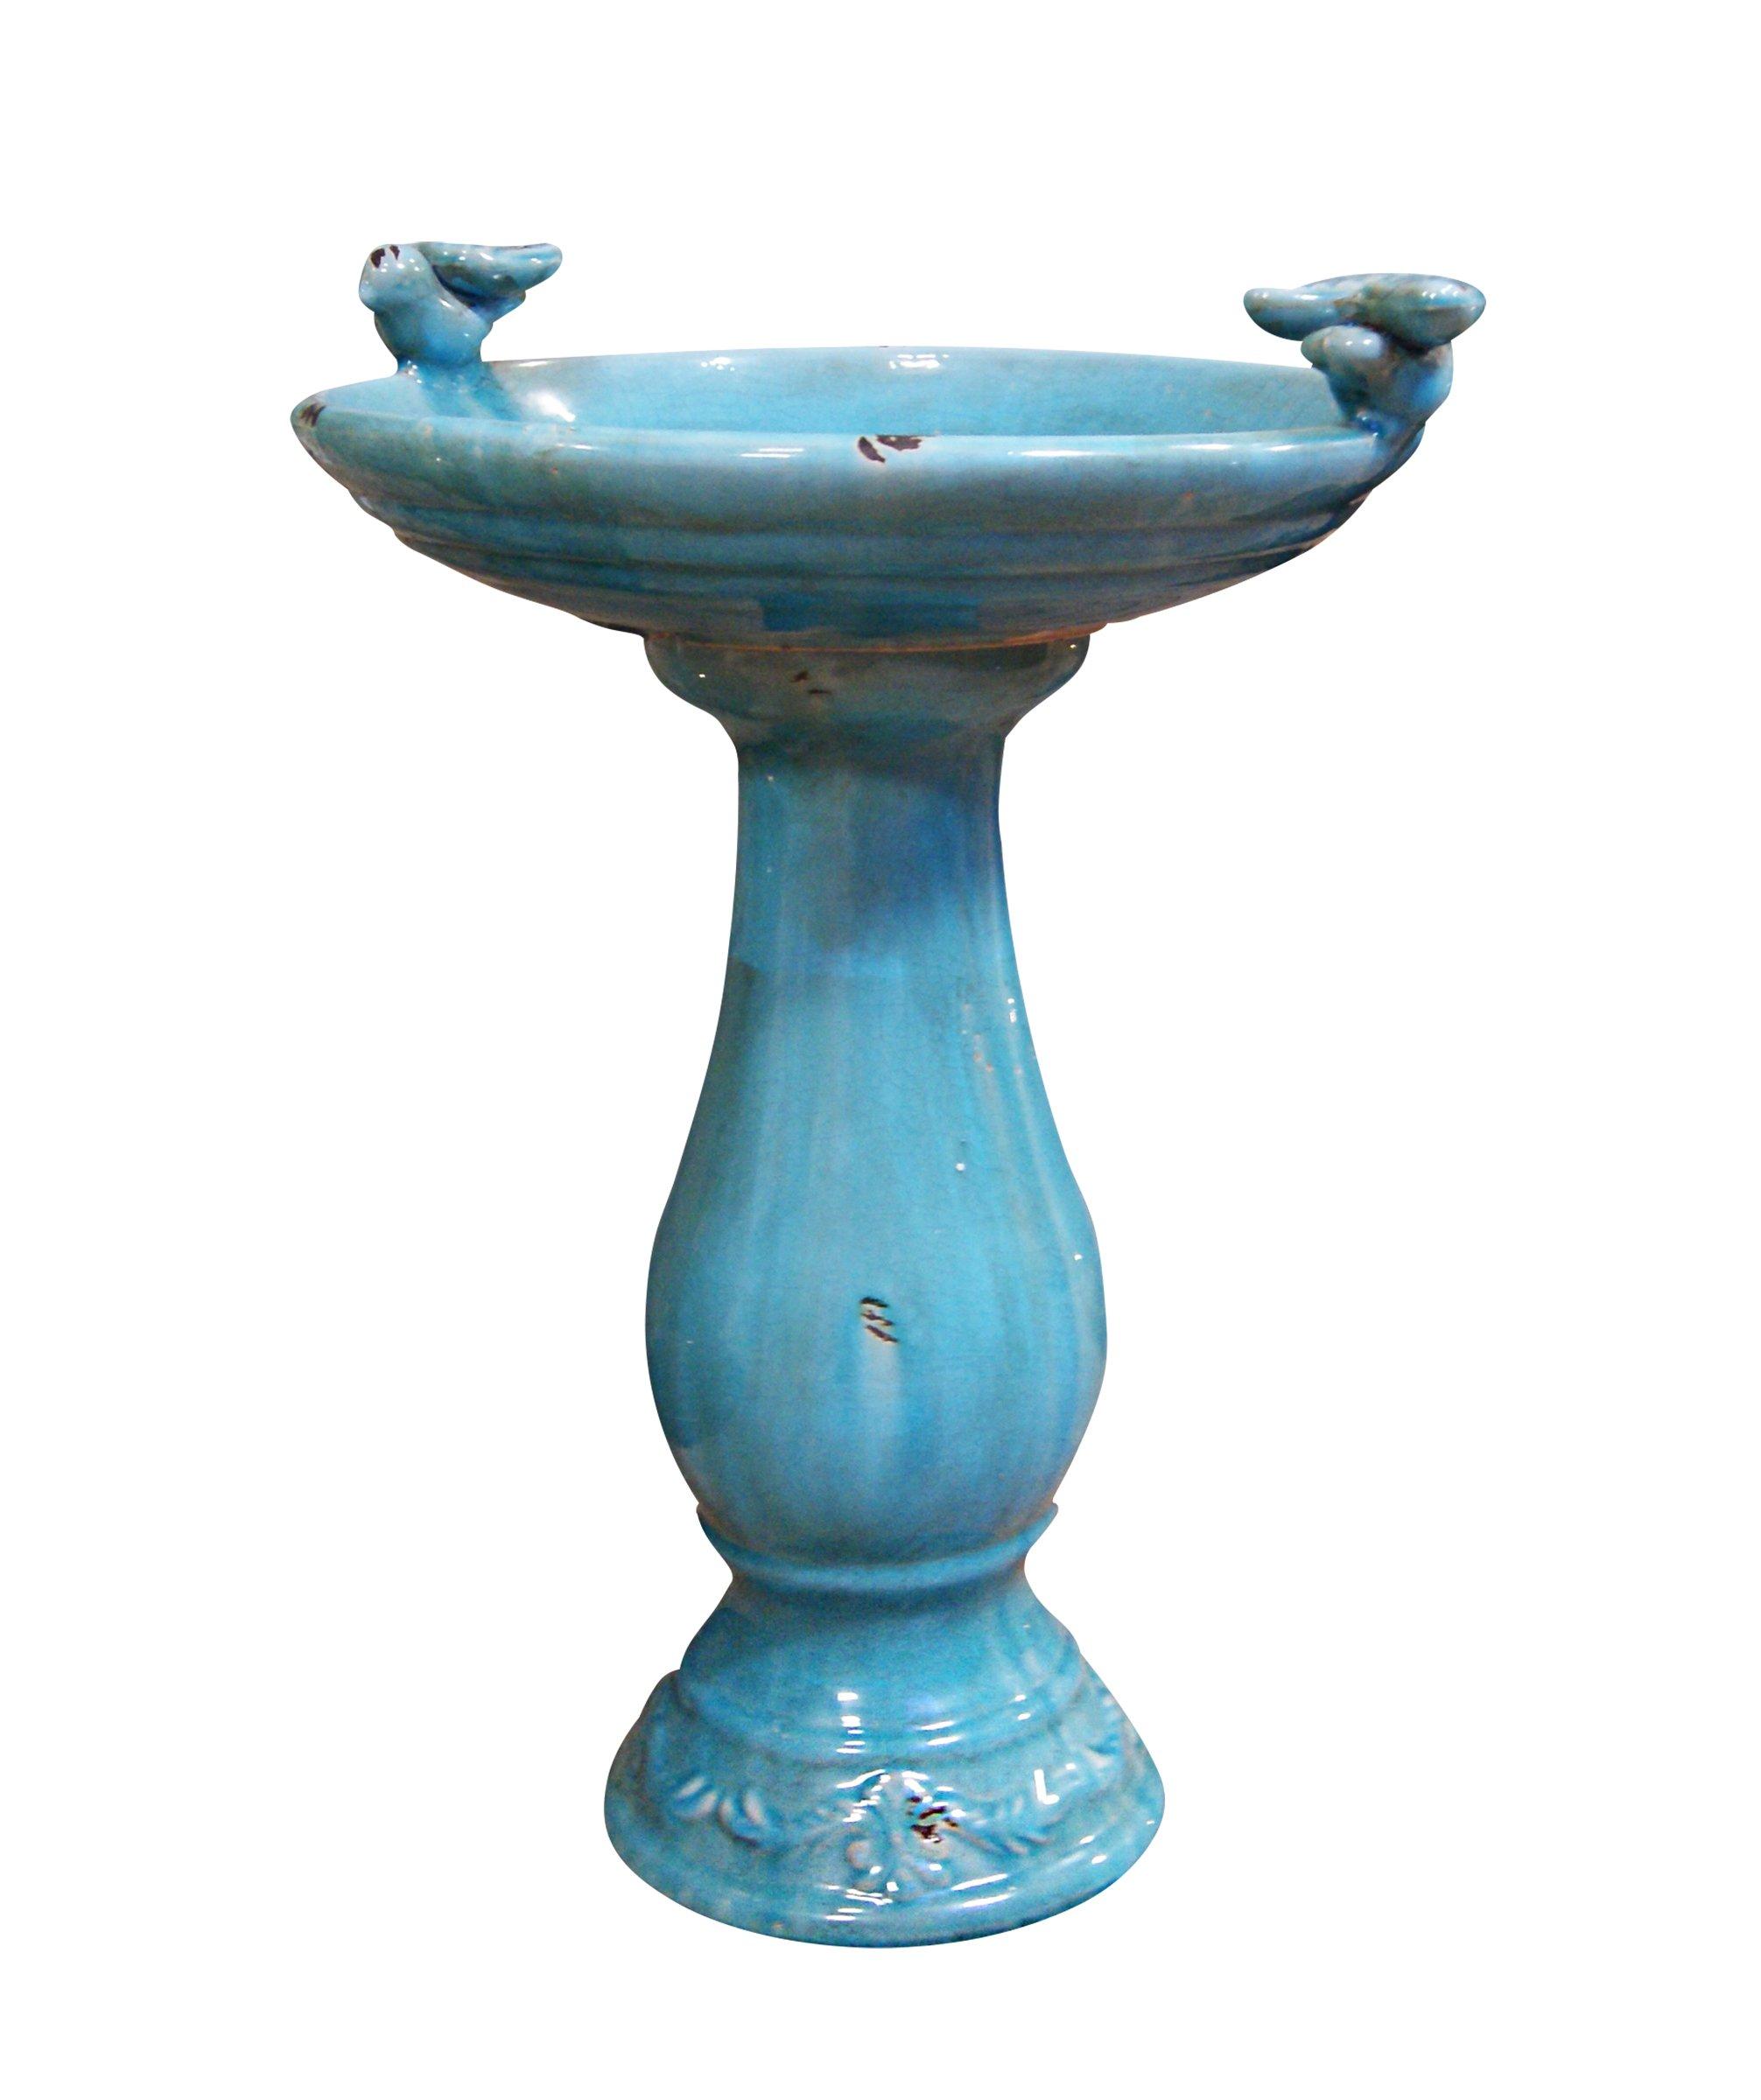 Benzara Antique Ceramic Bird Bath with 2 Birds, Turquoise by Benzara